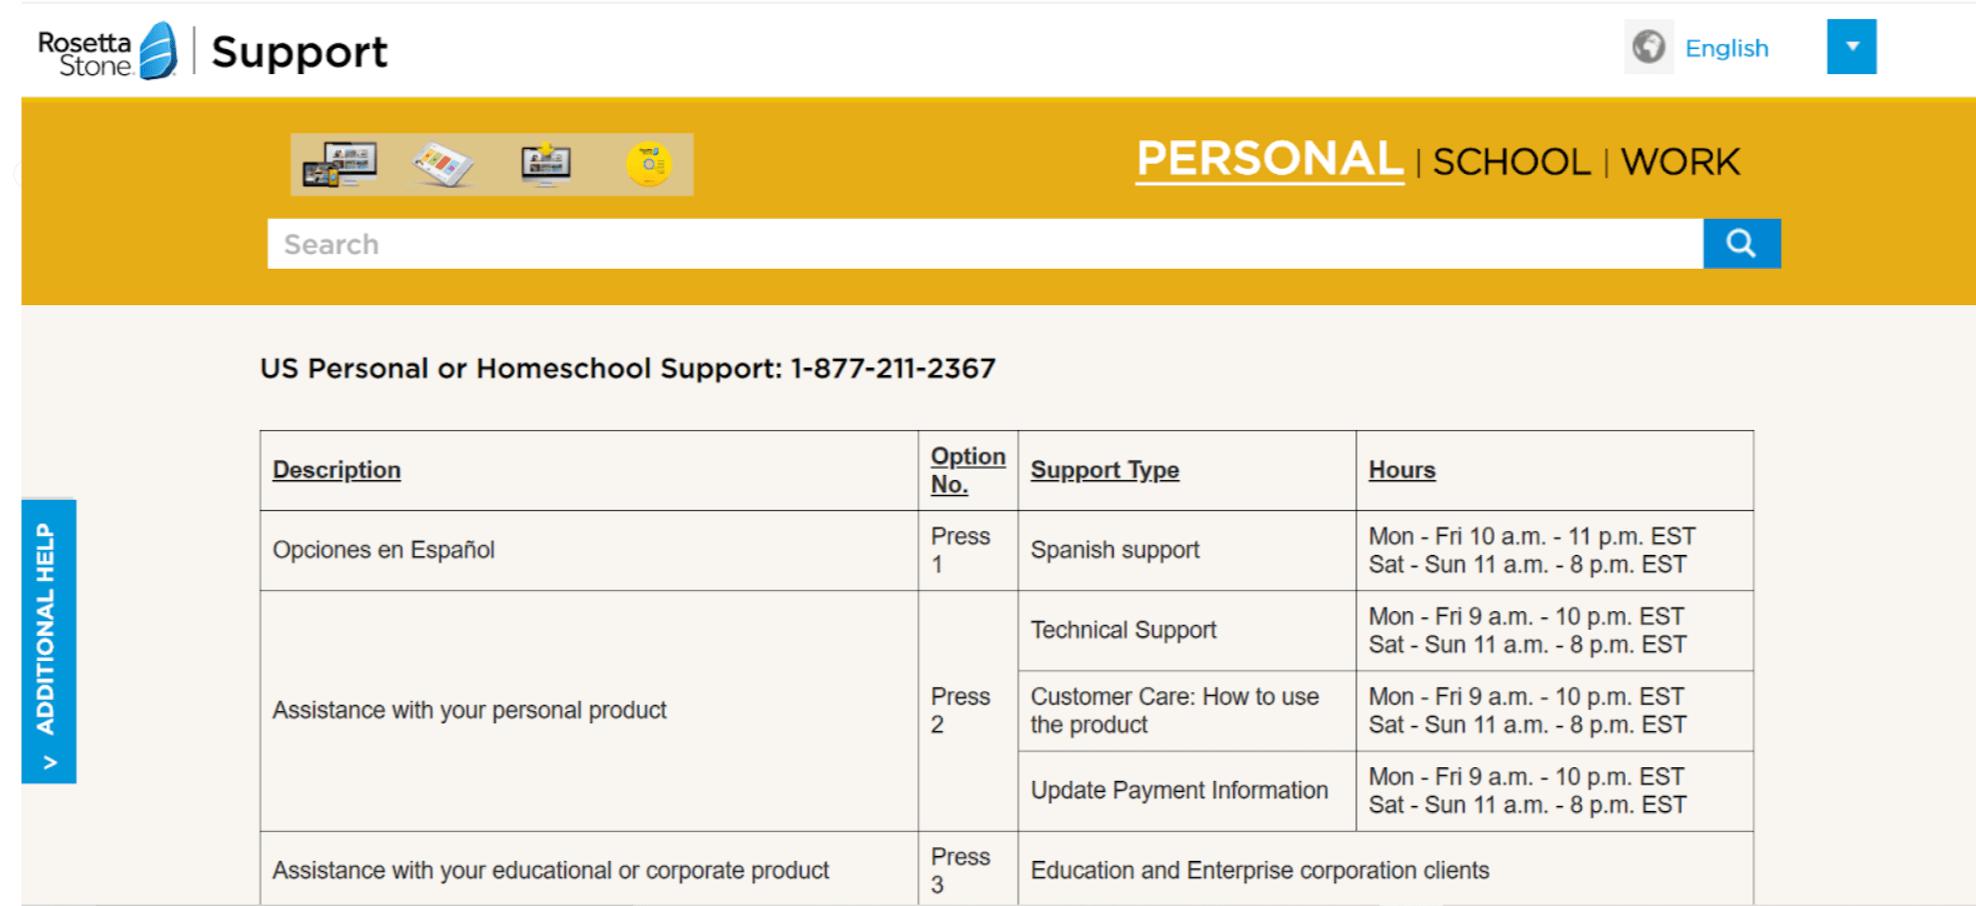 Rosetta Stone customer care